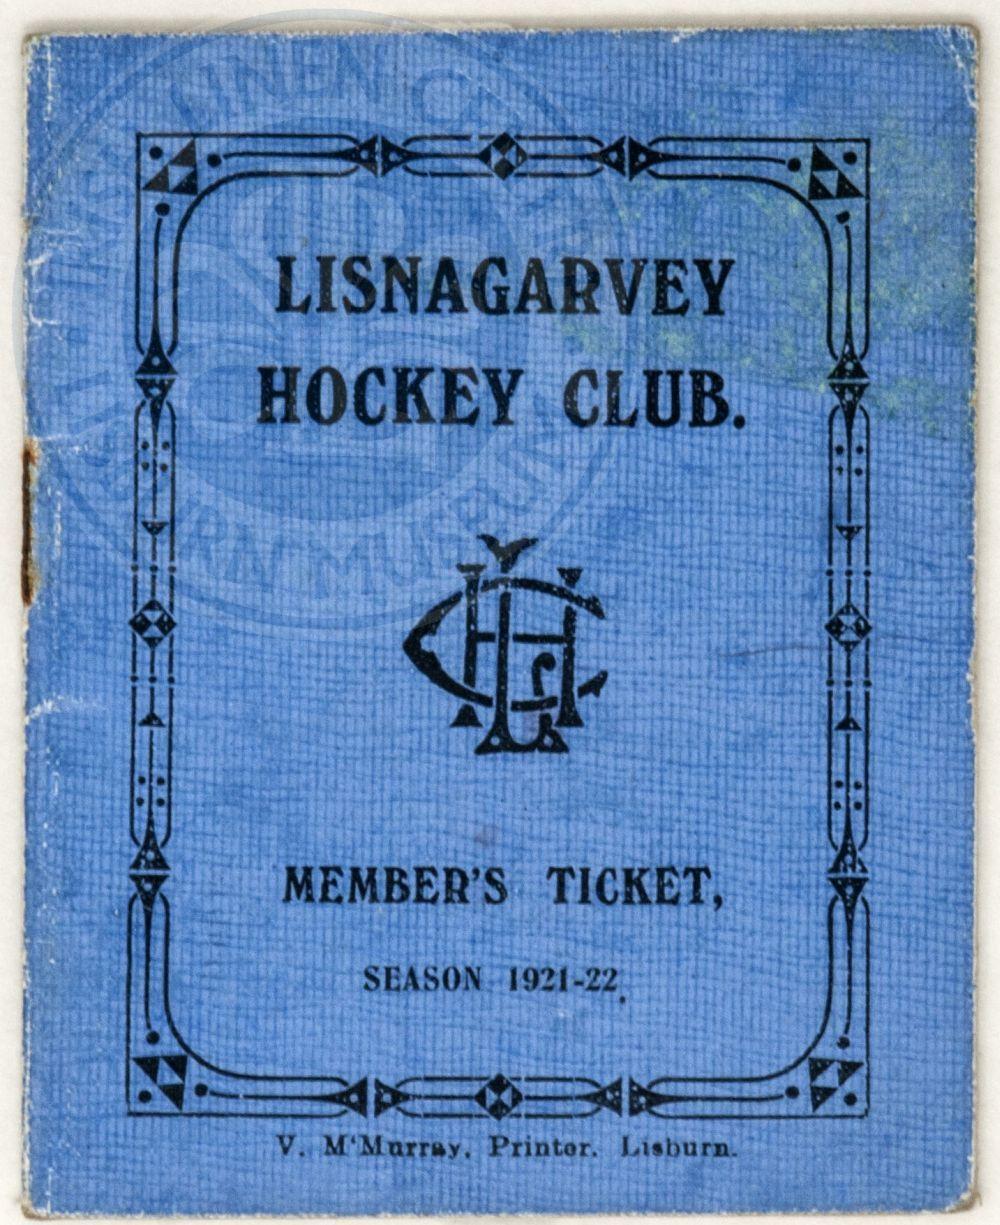 Lisnagarvey Hockey Club Members Ticket, Season 1921-22 - ILC&LM Collection